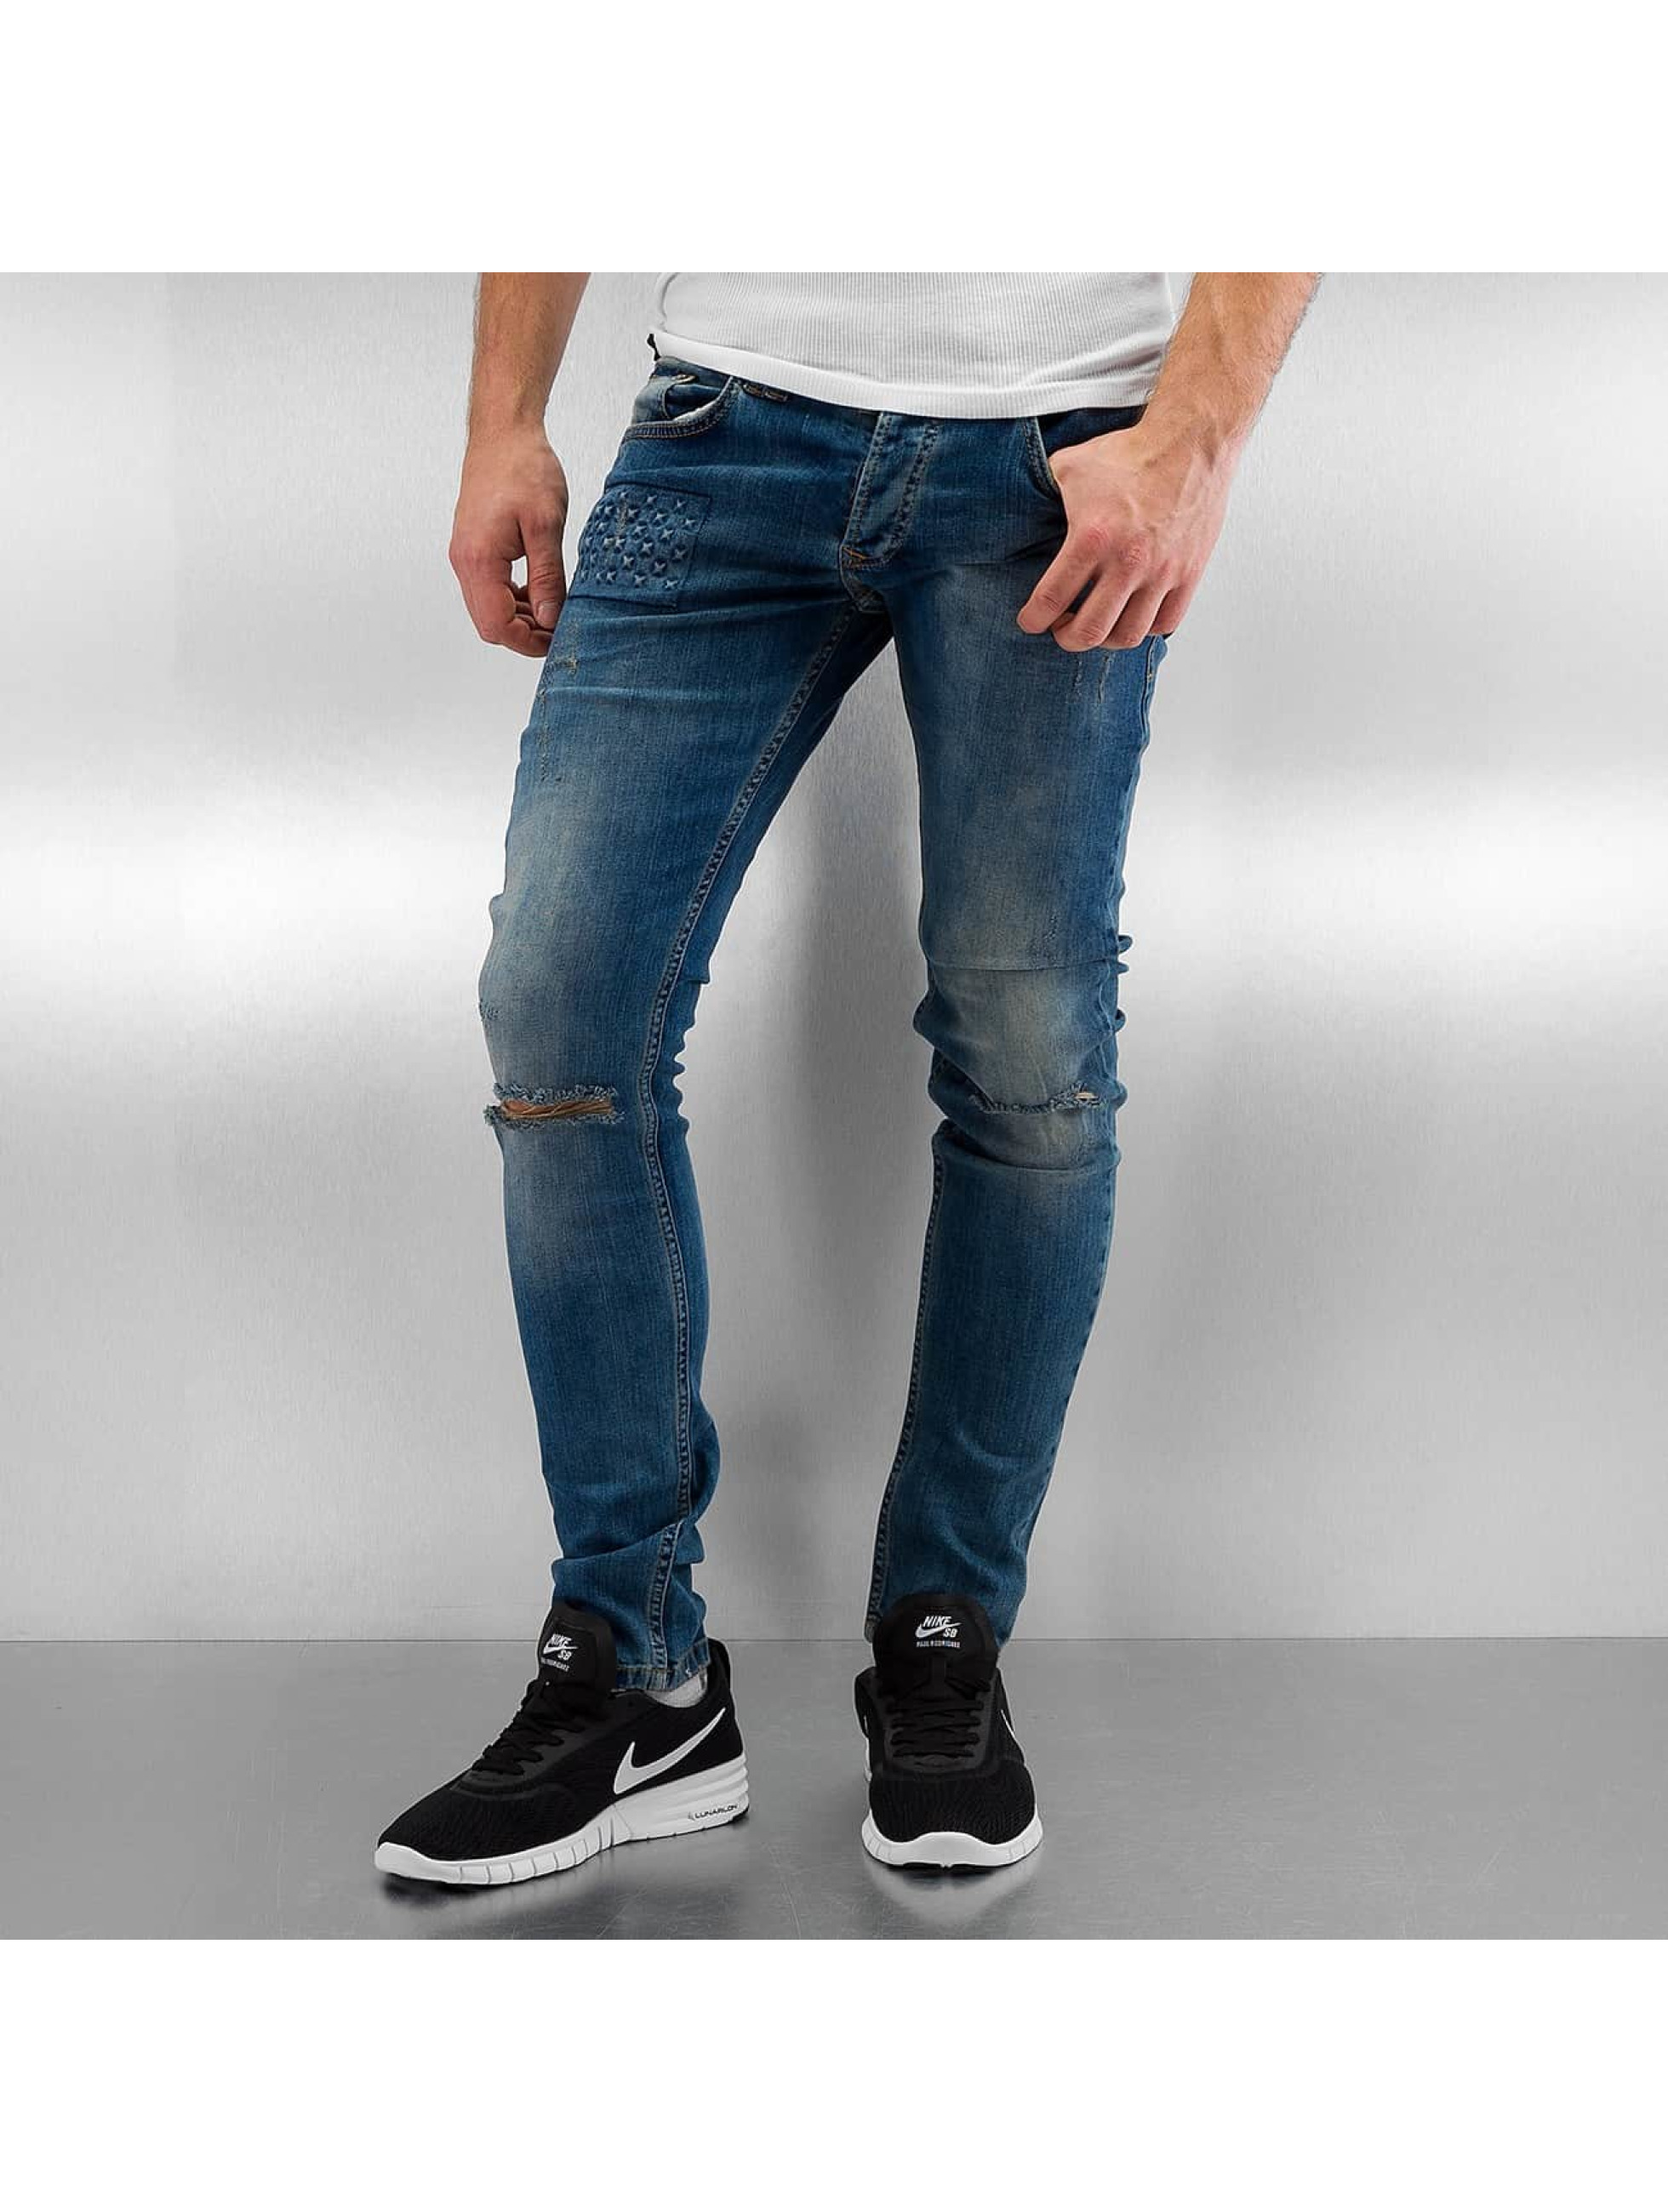 2Y / Skinny Jeans Jaxon in blue W 34